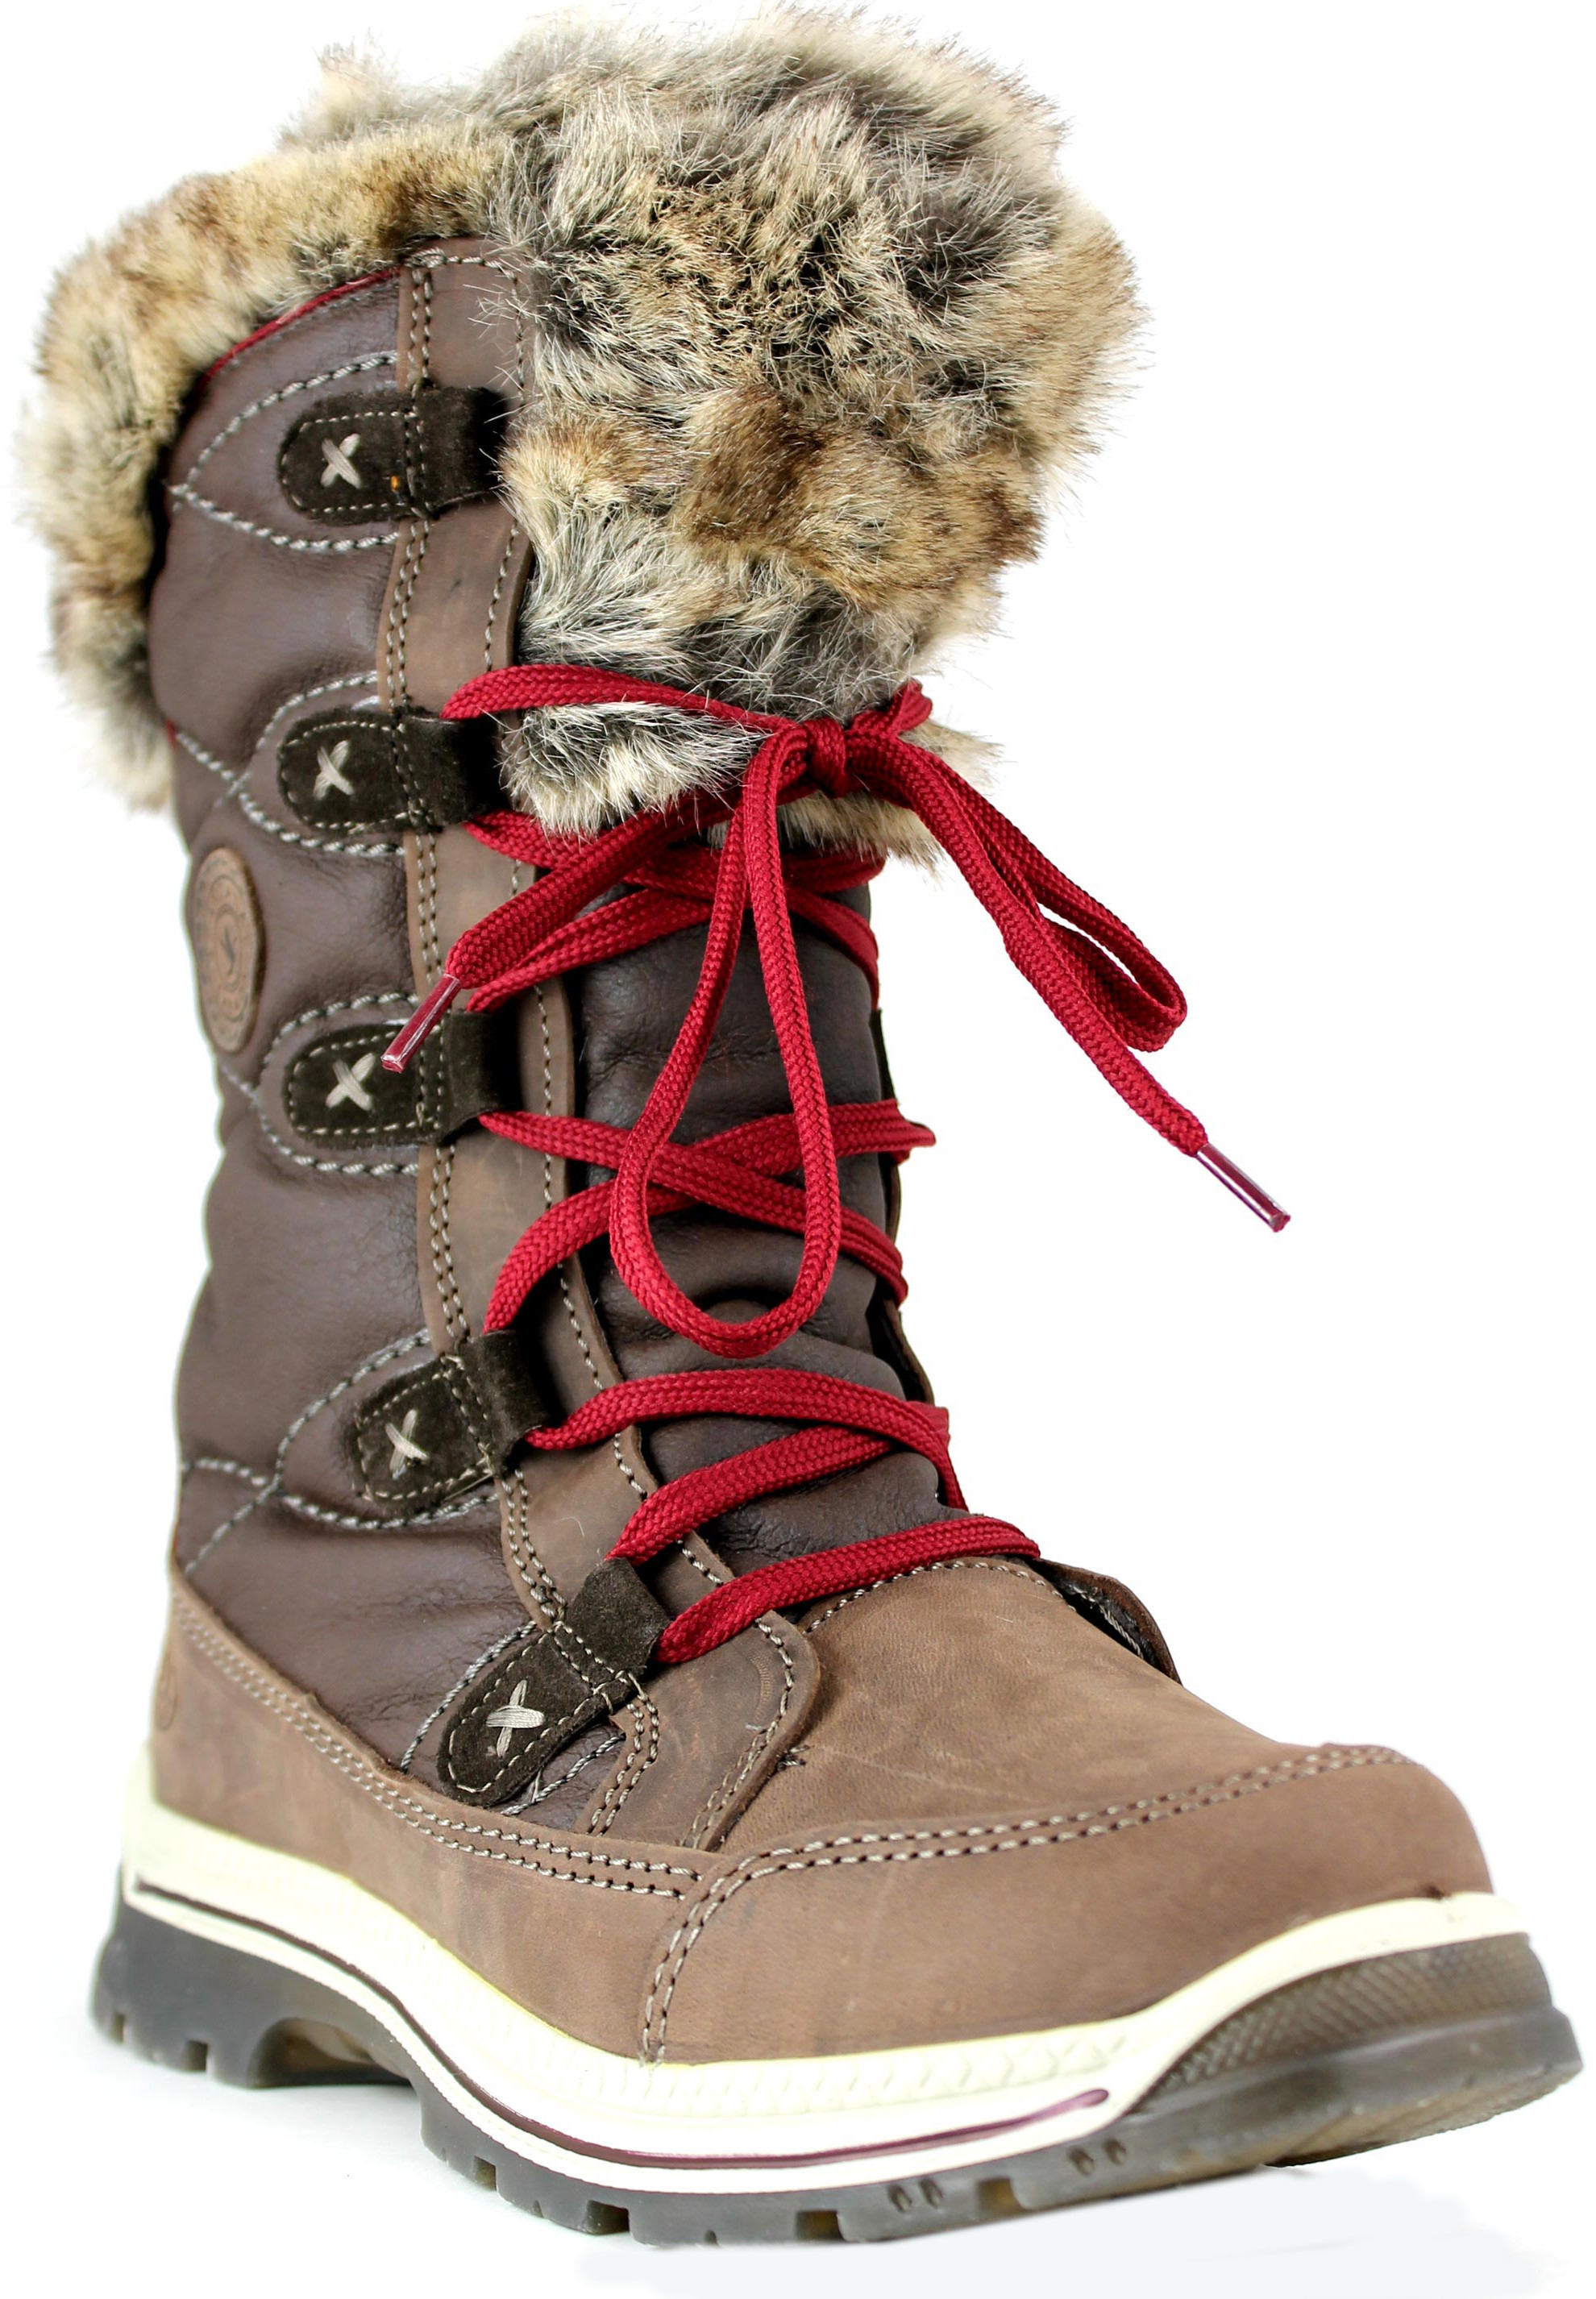 9cf6c86d59b43 Santana Canada Muggati Winter Boot - Women's | Up to 16% Off w/ Free  Shipping and Handling